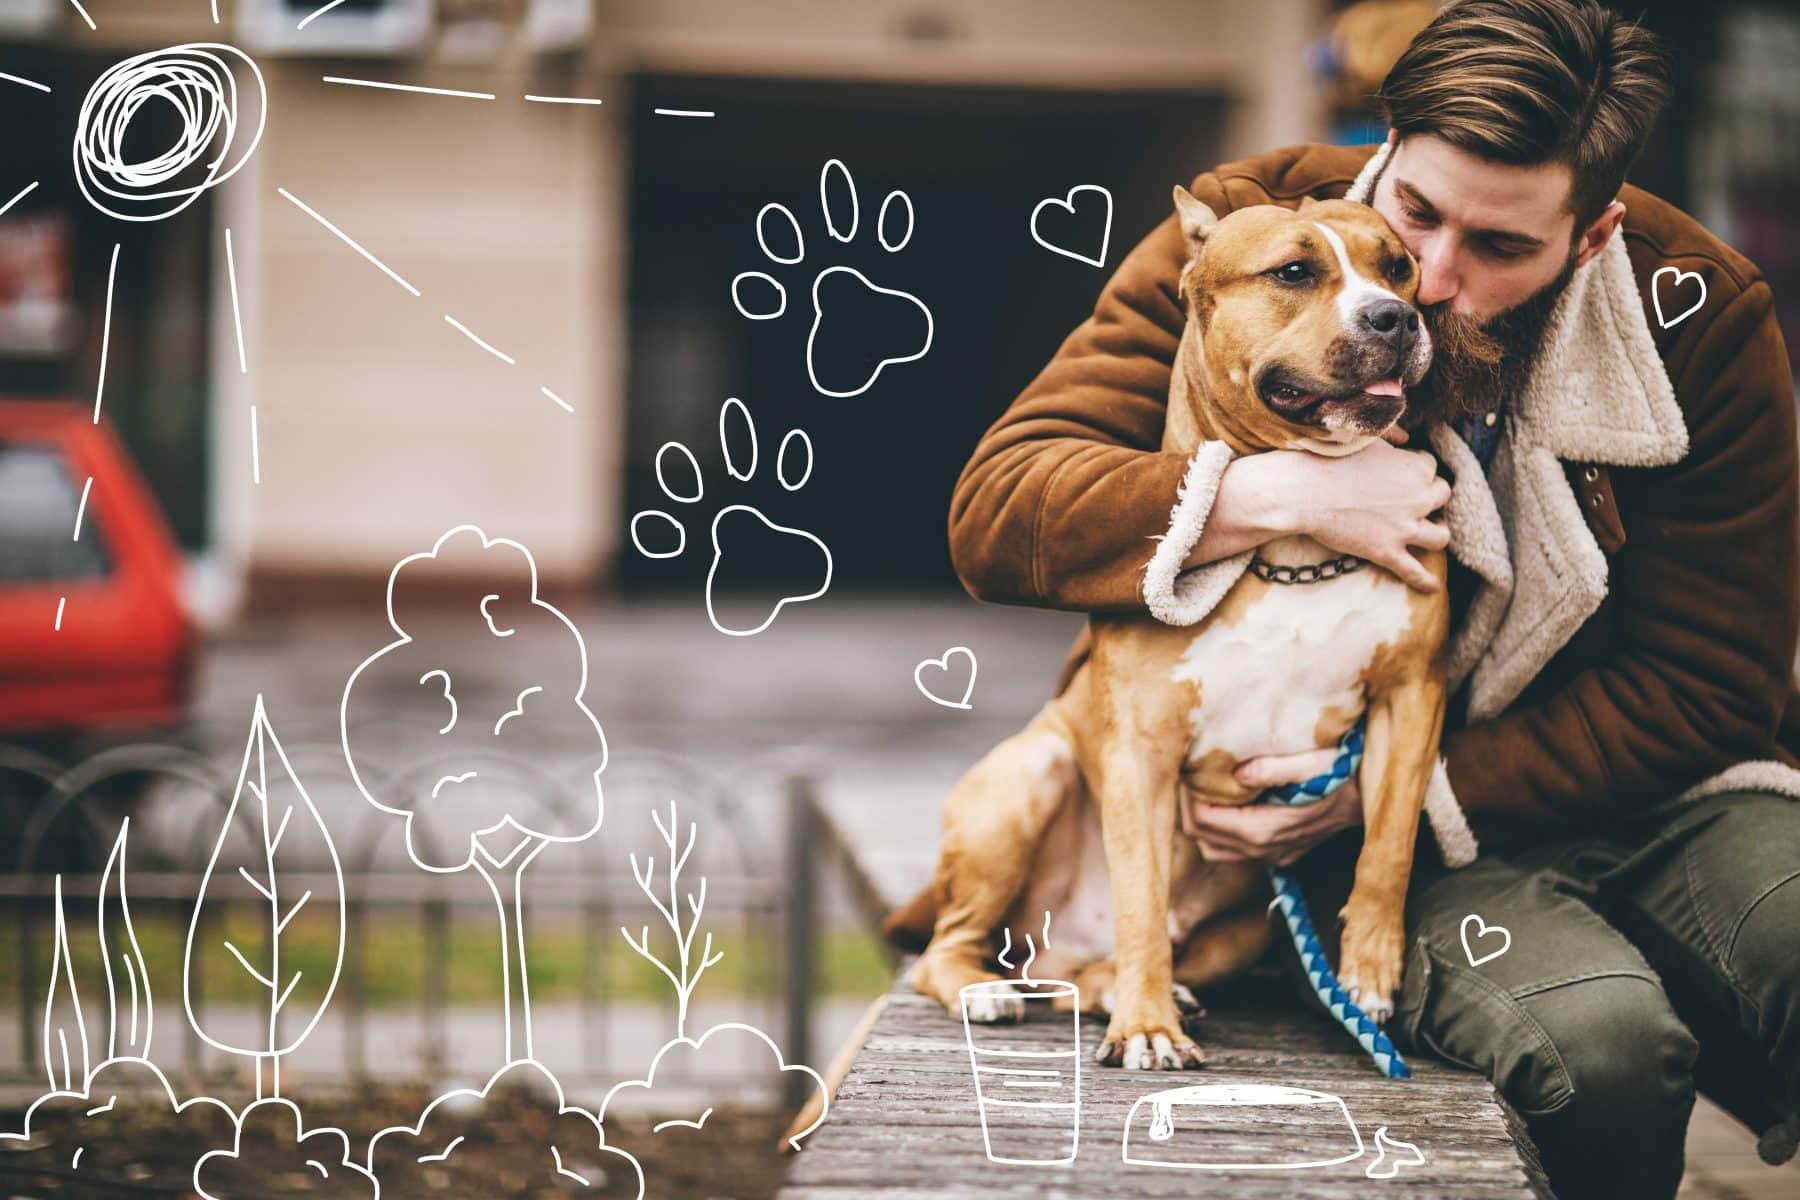 Pet diabetes - an kissing his terrier dog